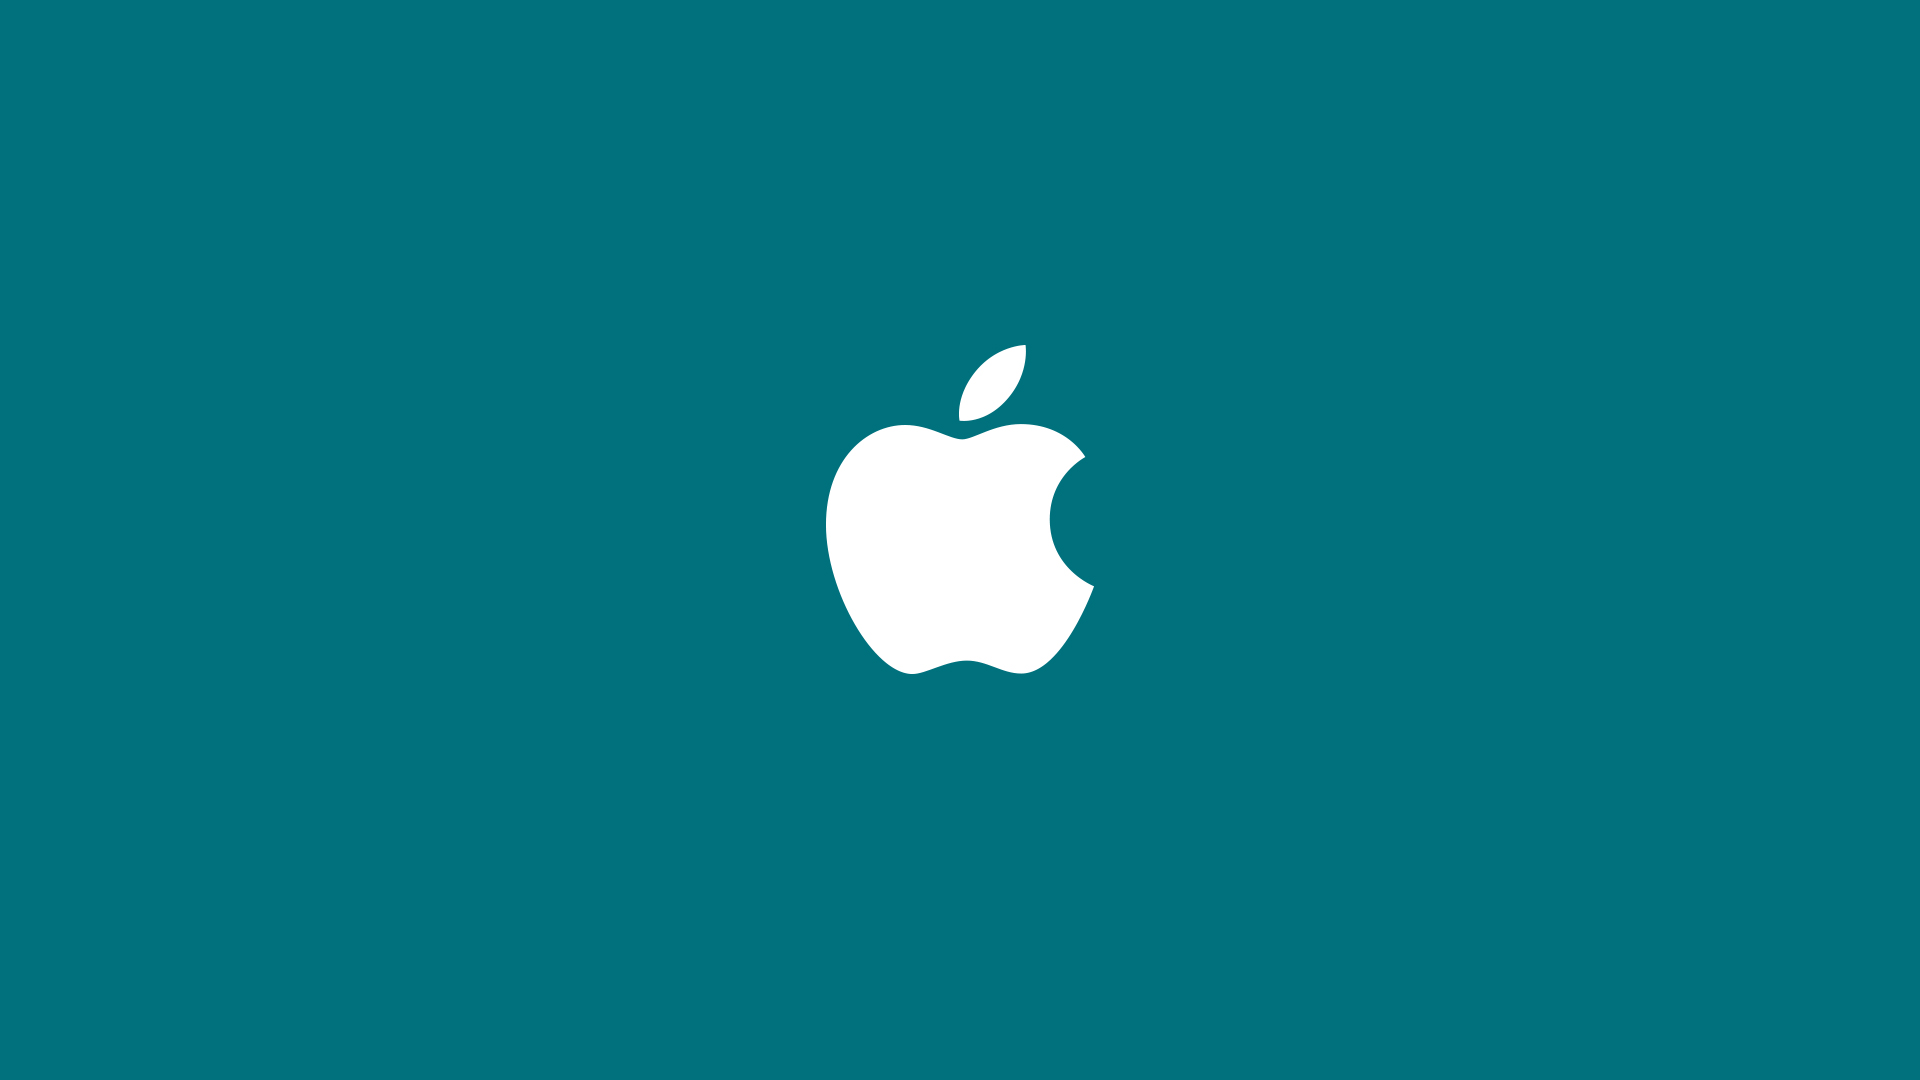 Logo de la marca Apple